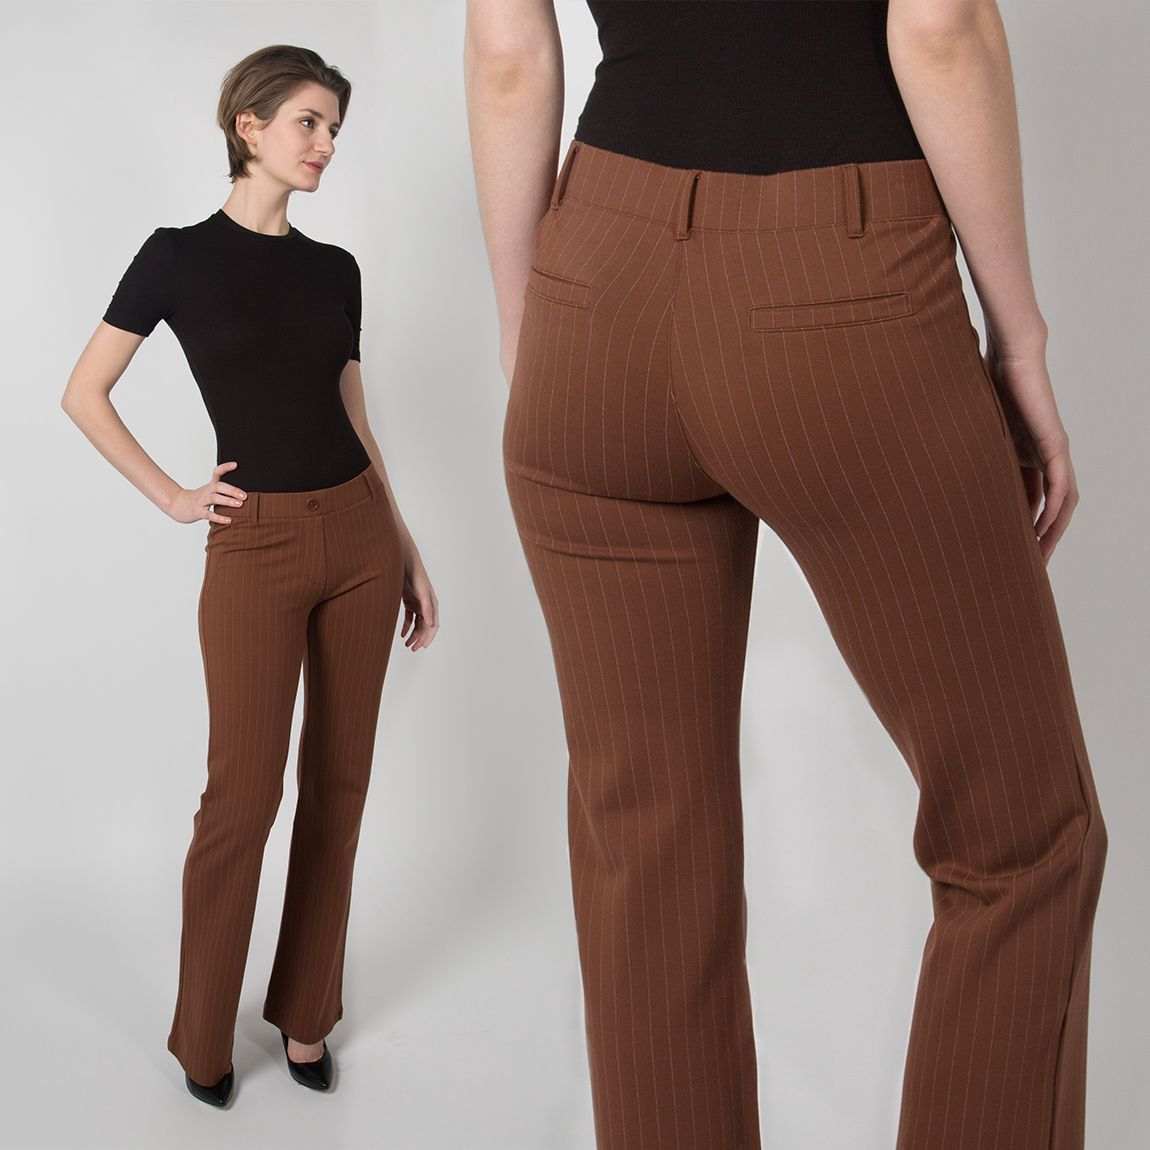 Boot-Cut | Brown Pinstripe Dress Pant Yoga Pants | Betabrand ...